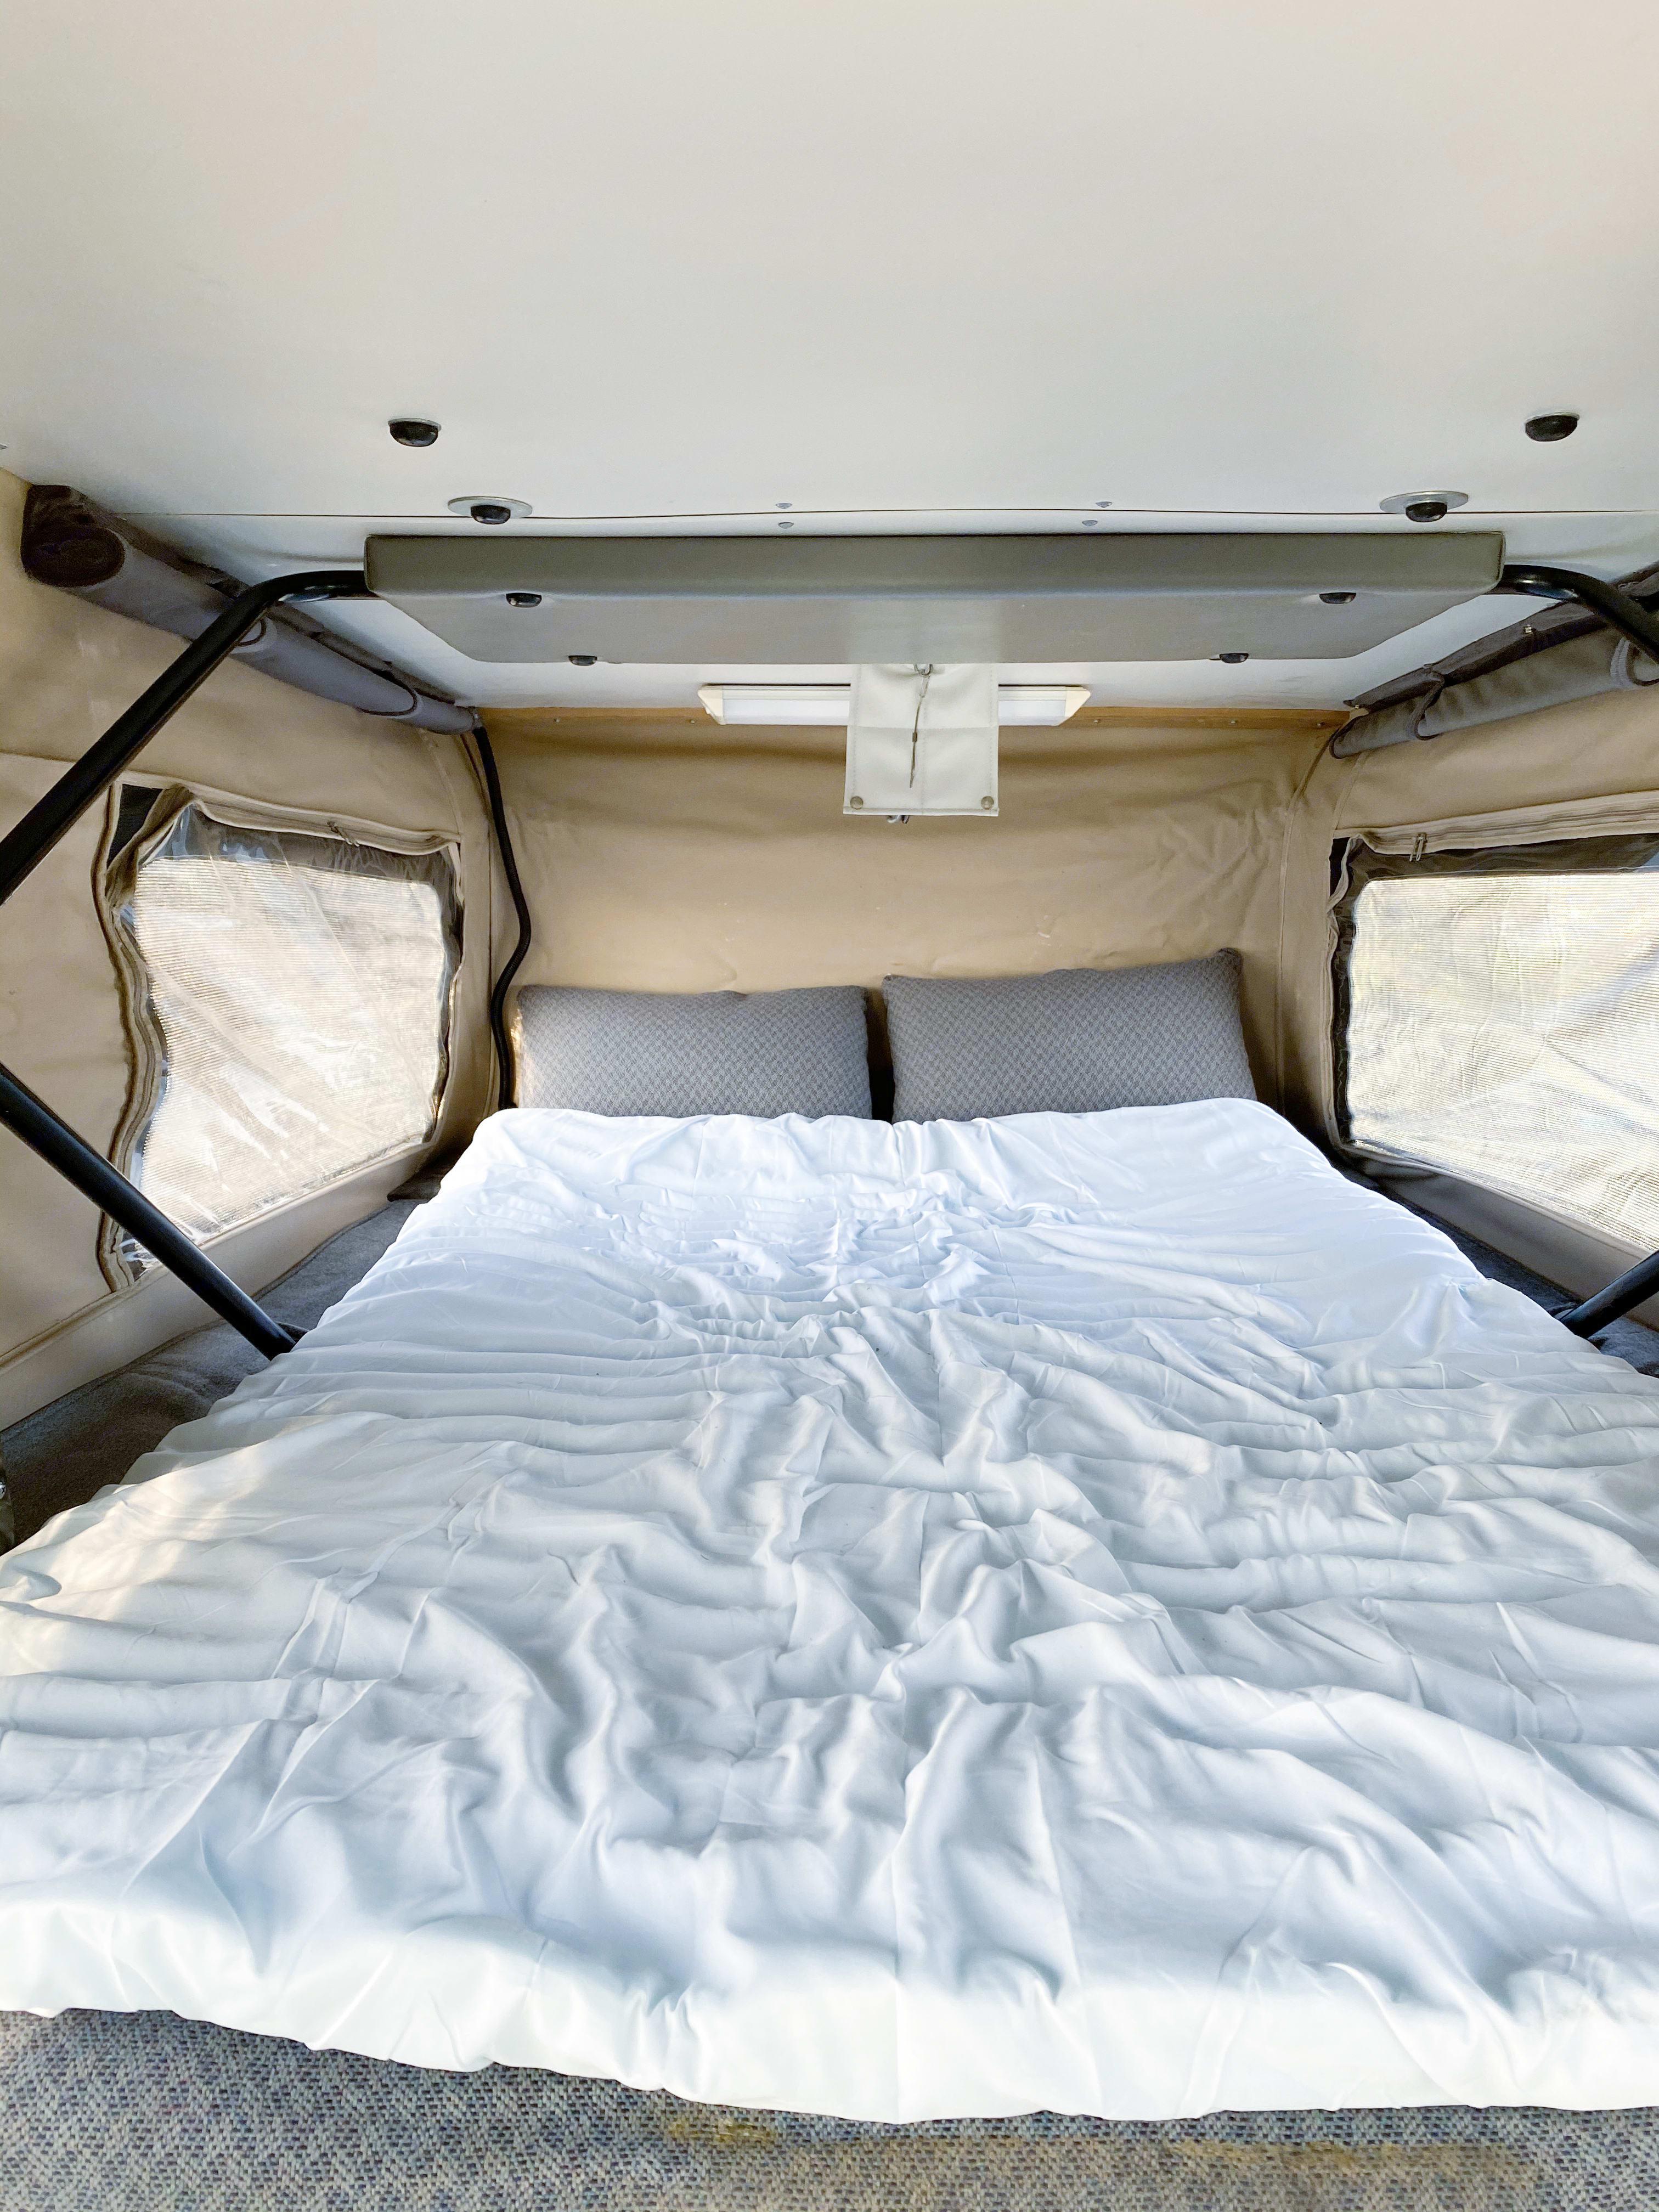 Penthouse full size bed. Sportsmobile E350 2003